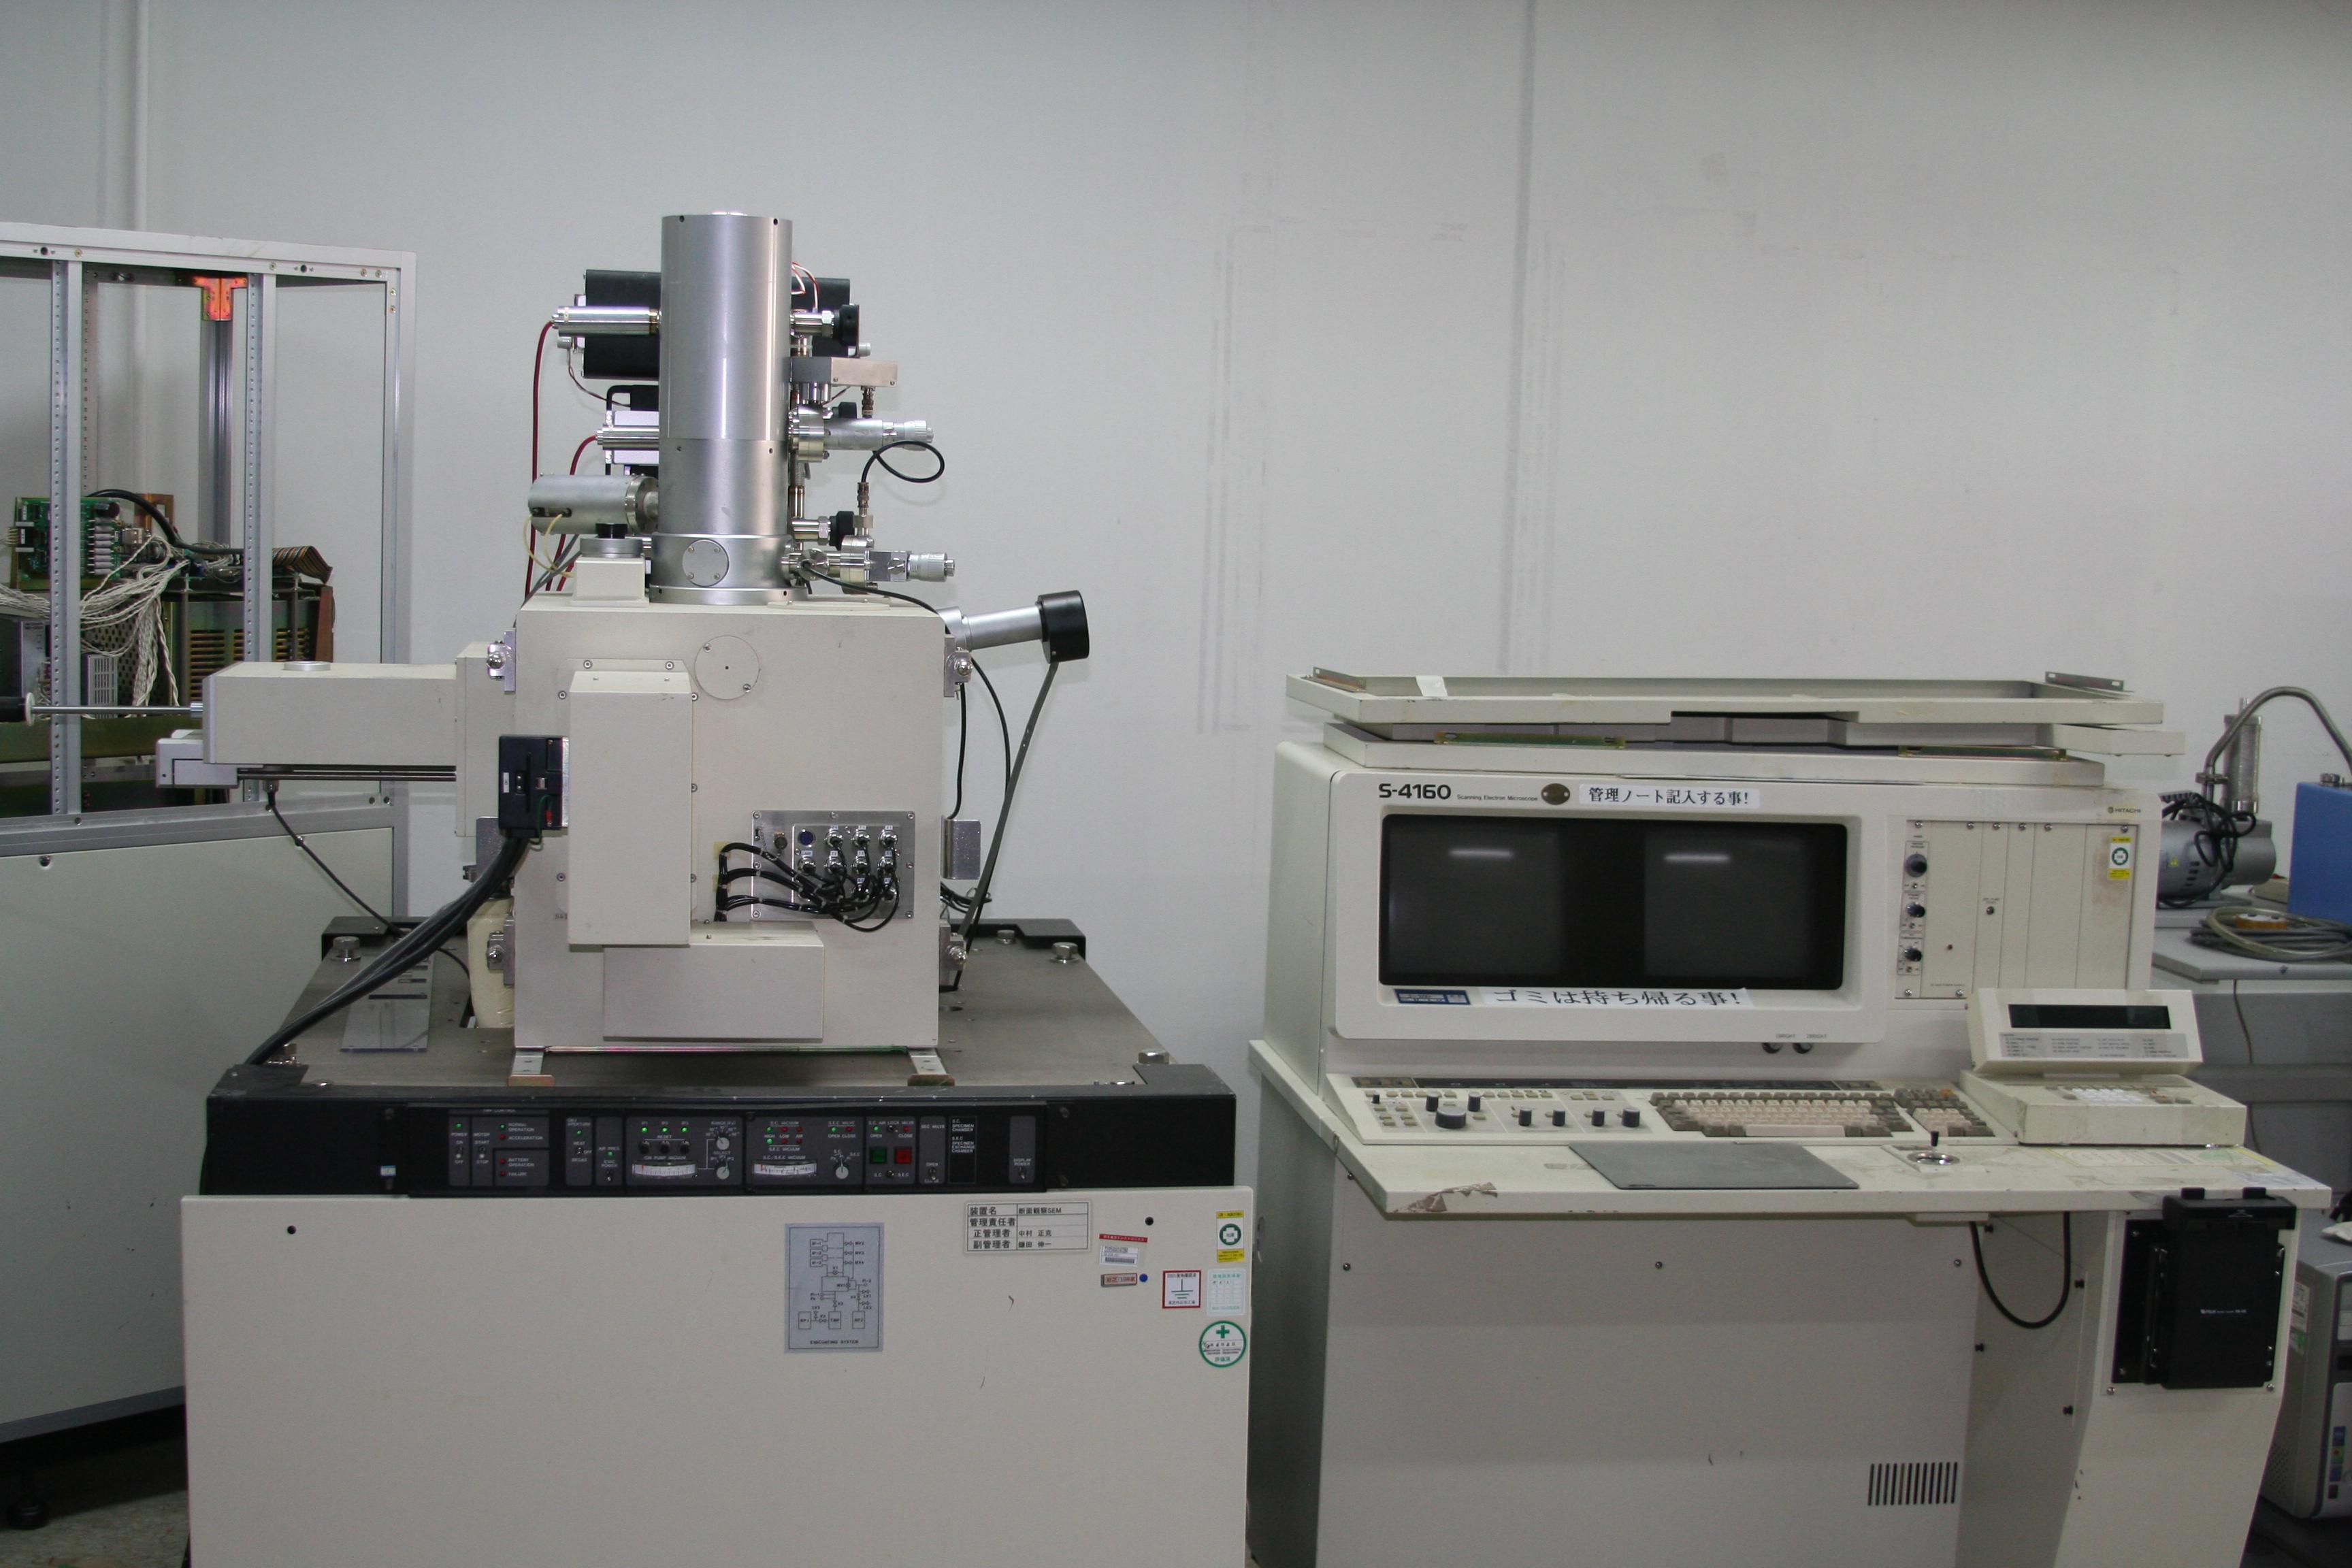 003 S-4160.jpg